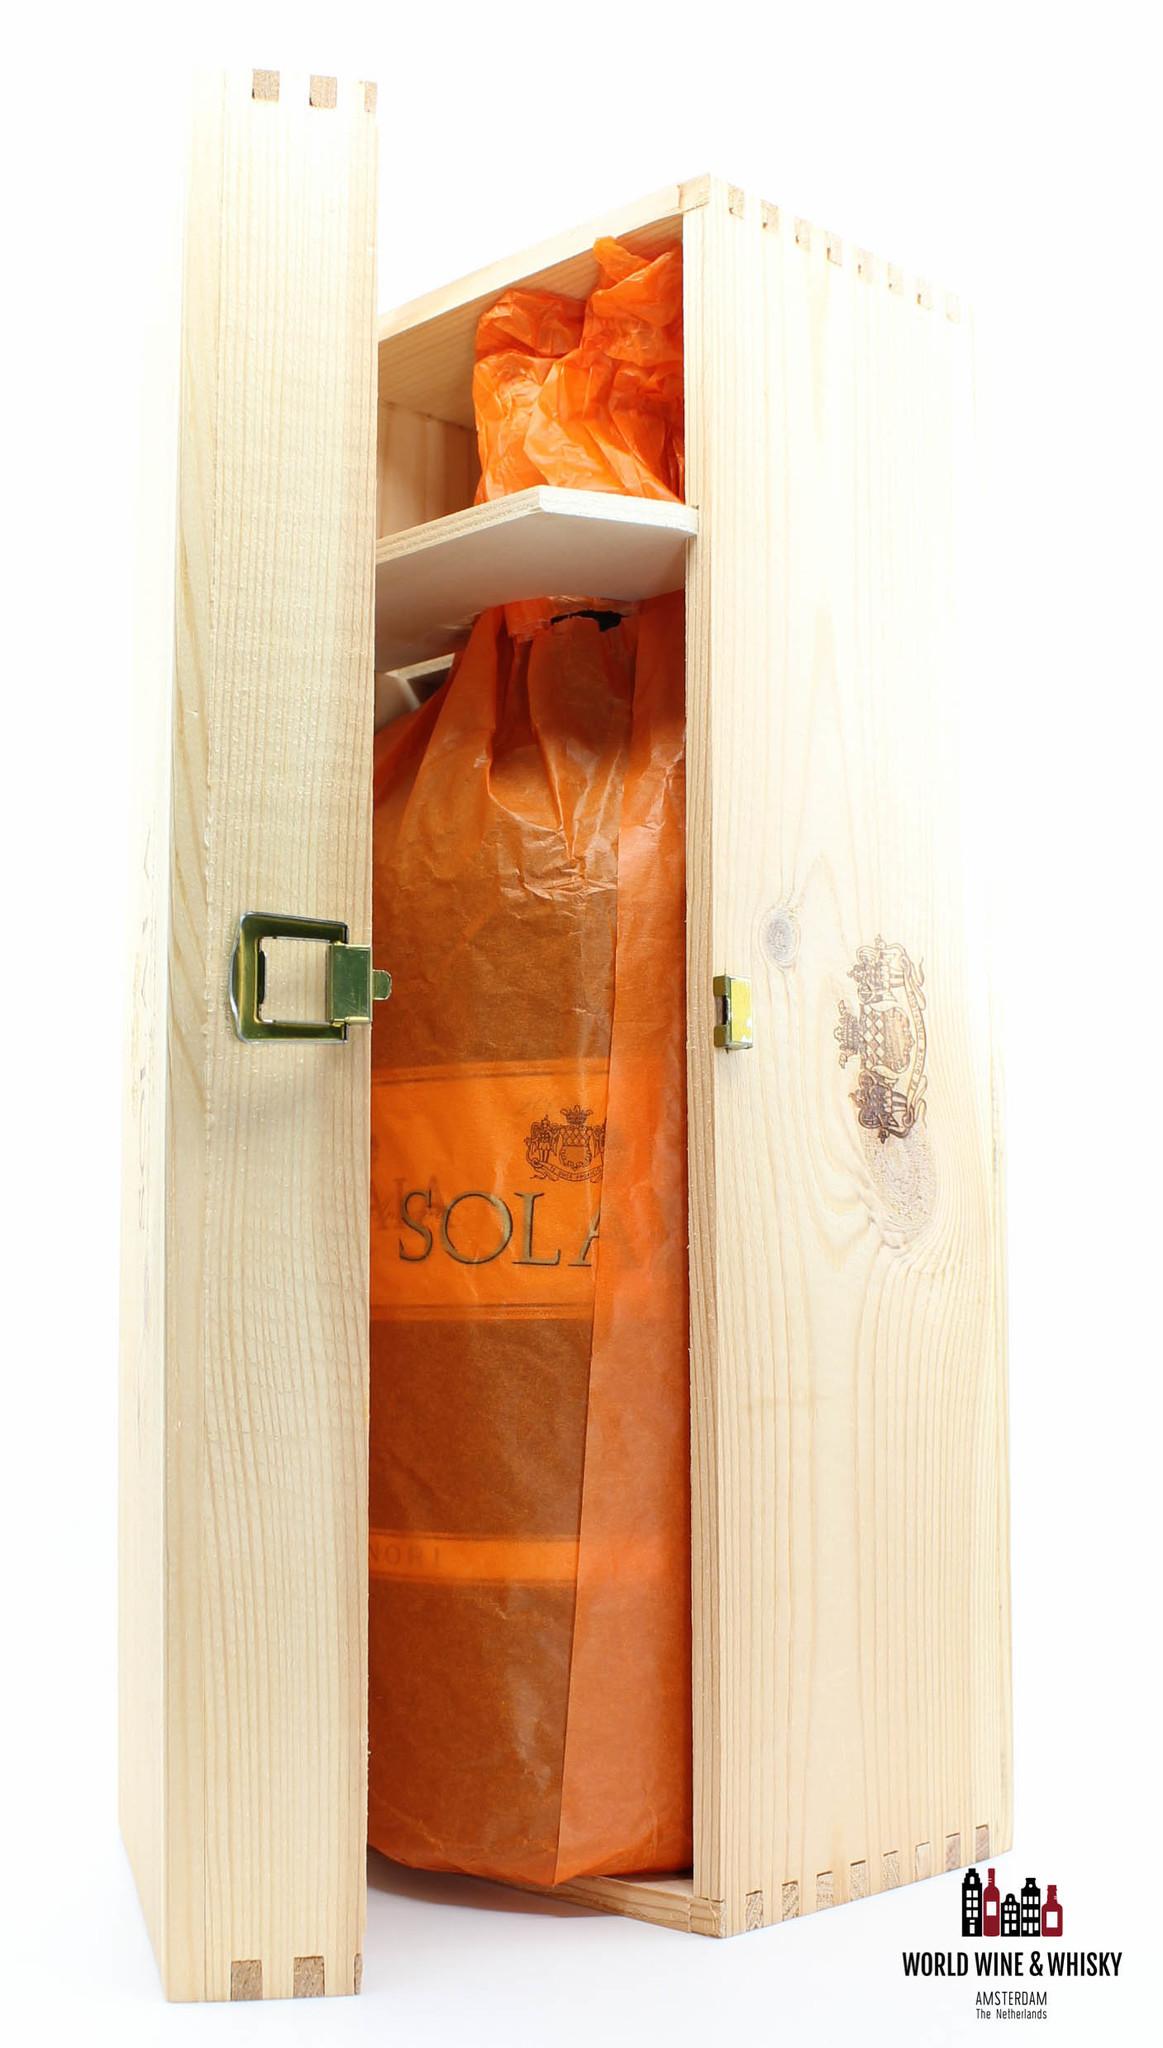 Solaia Antinori Marchesi Antinori Solaia 2009 Double Magnum in OWC (3L)